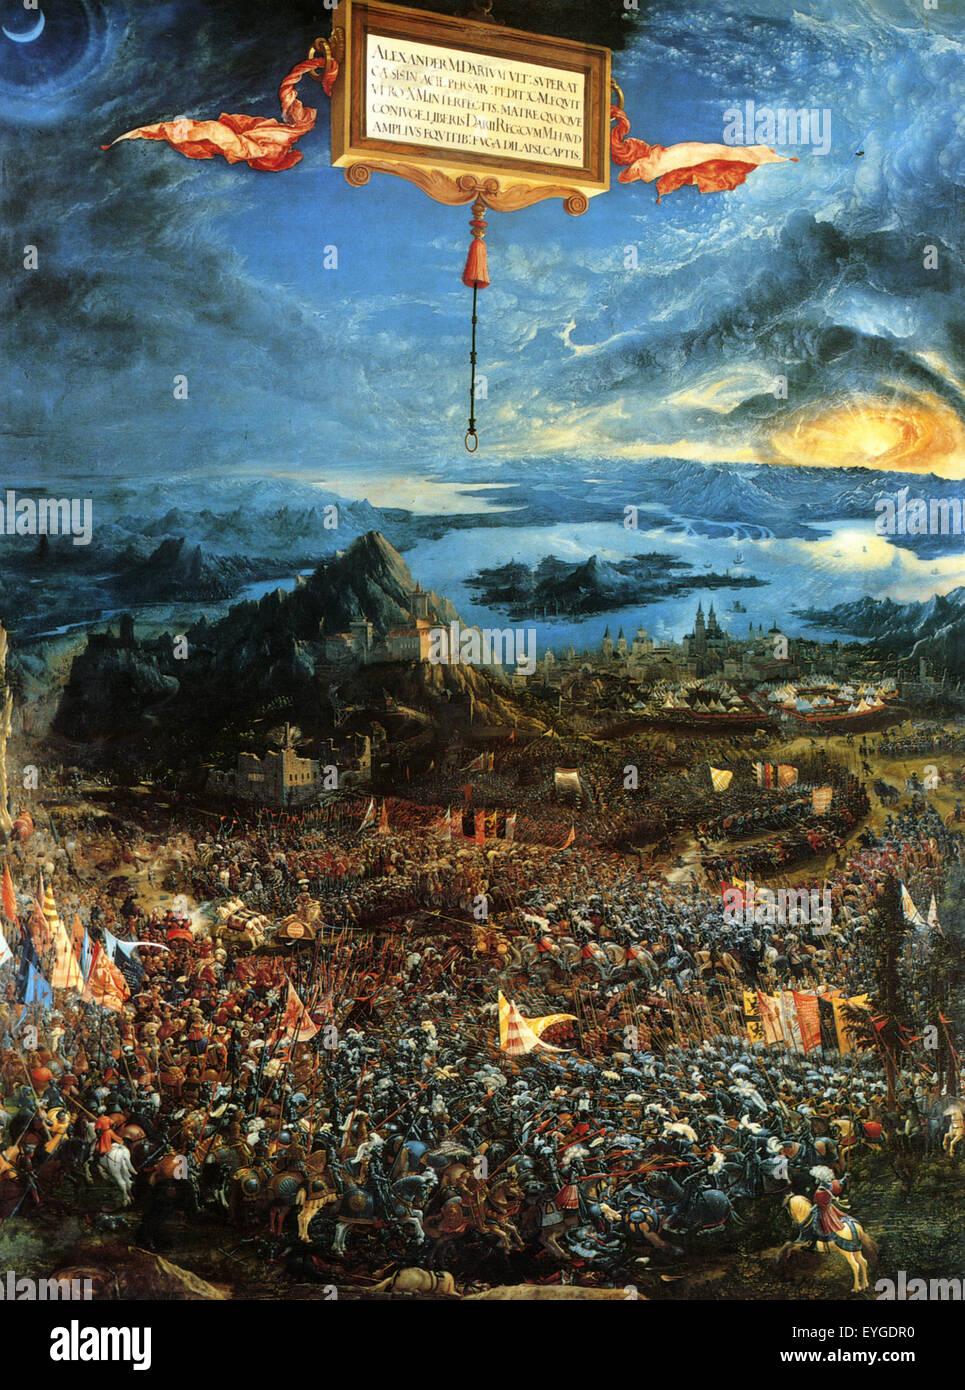 Albrecht Altdorfer - The Battle of Issus - XVI th century - Flemish - Stock Image